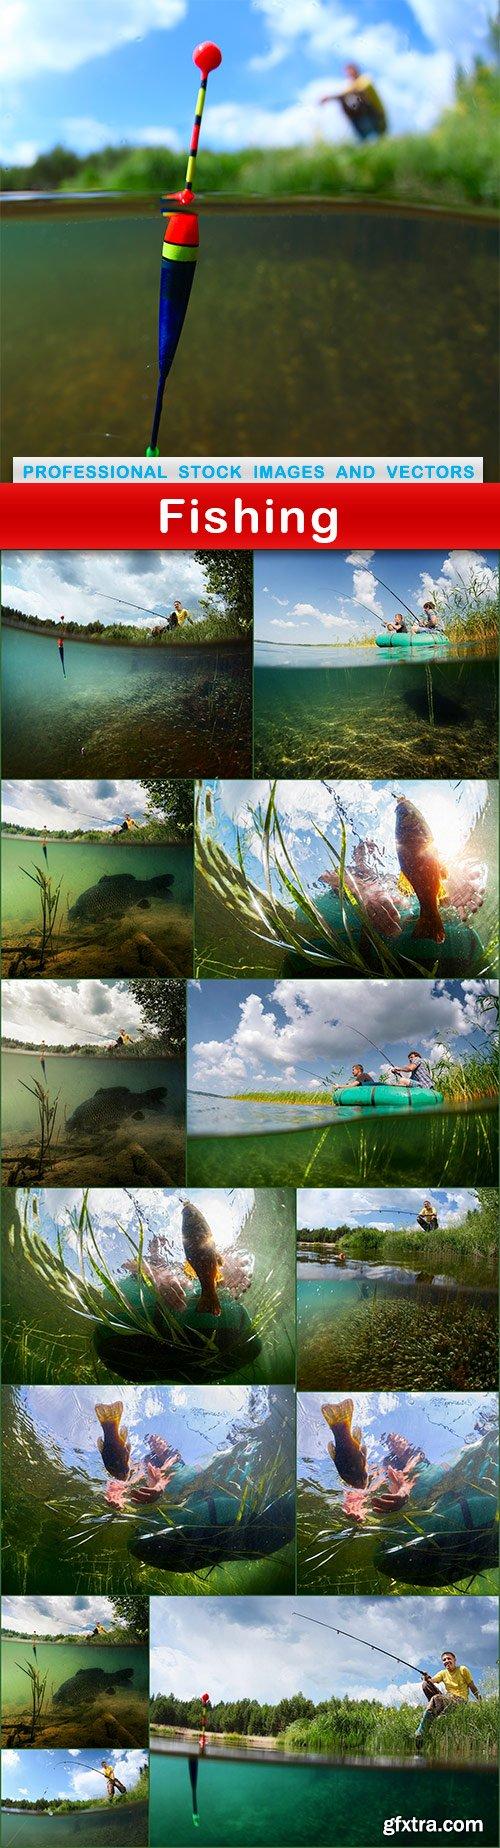 Fishing - 14 UHQ JPEG